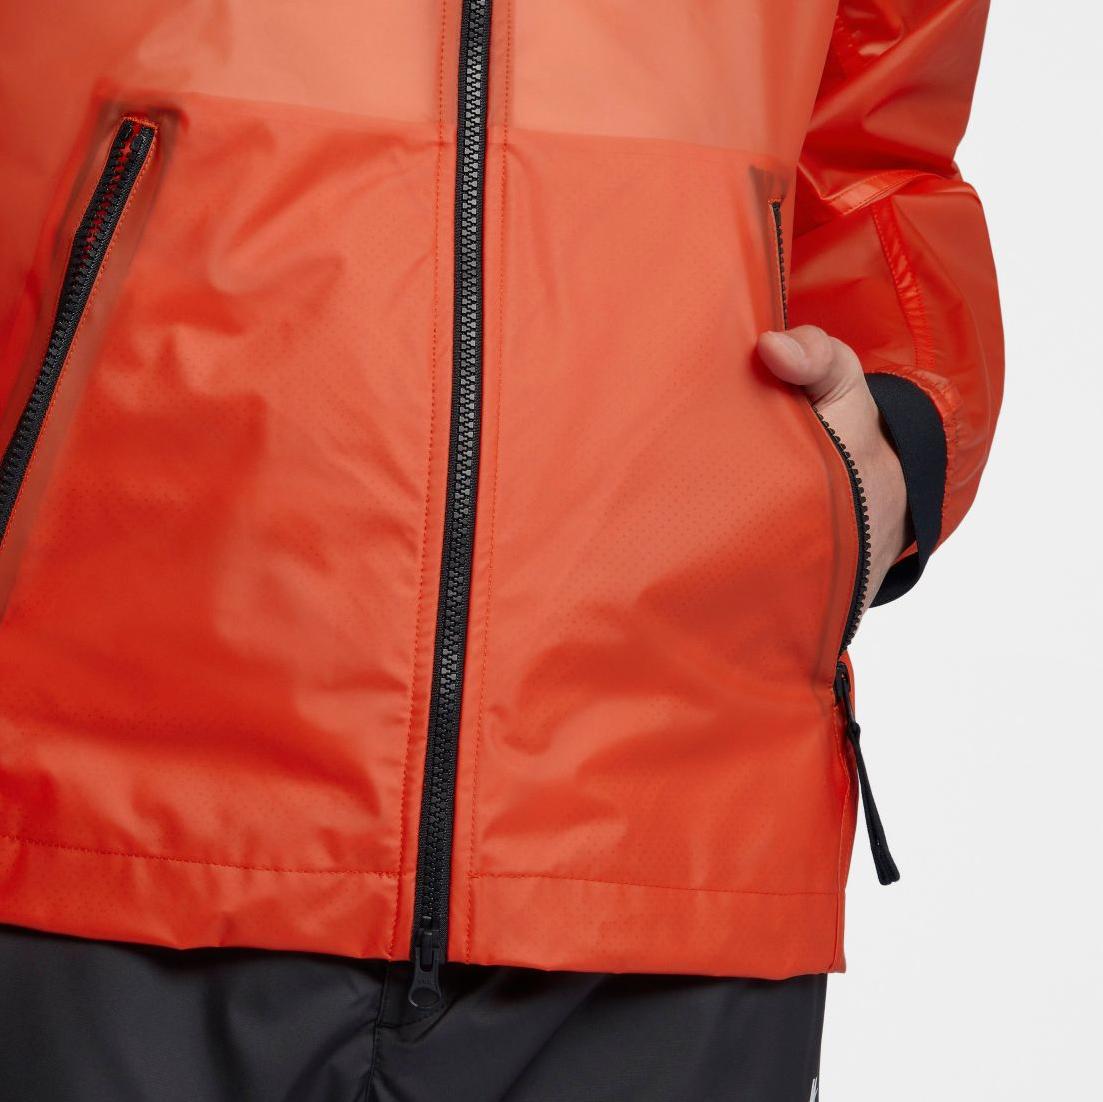 nike-air-safari-orange-jacket-4